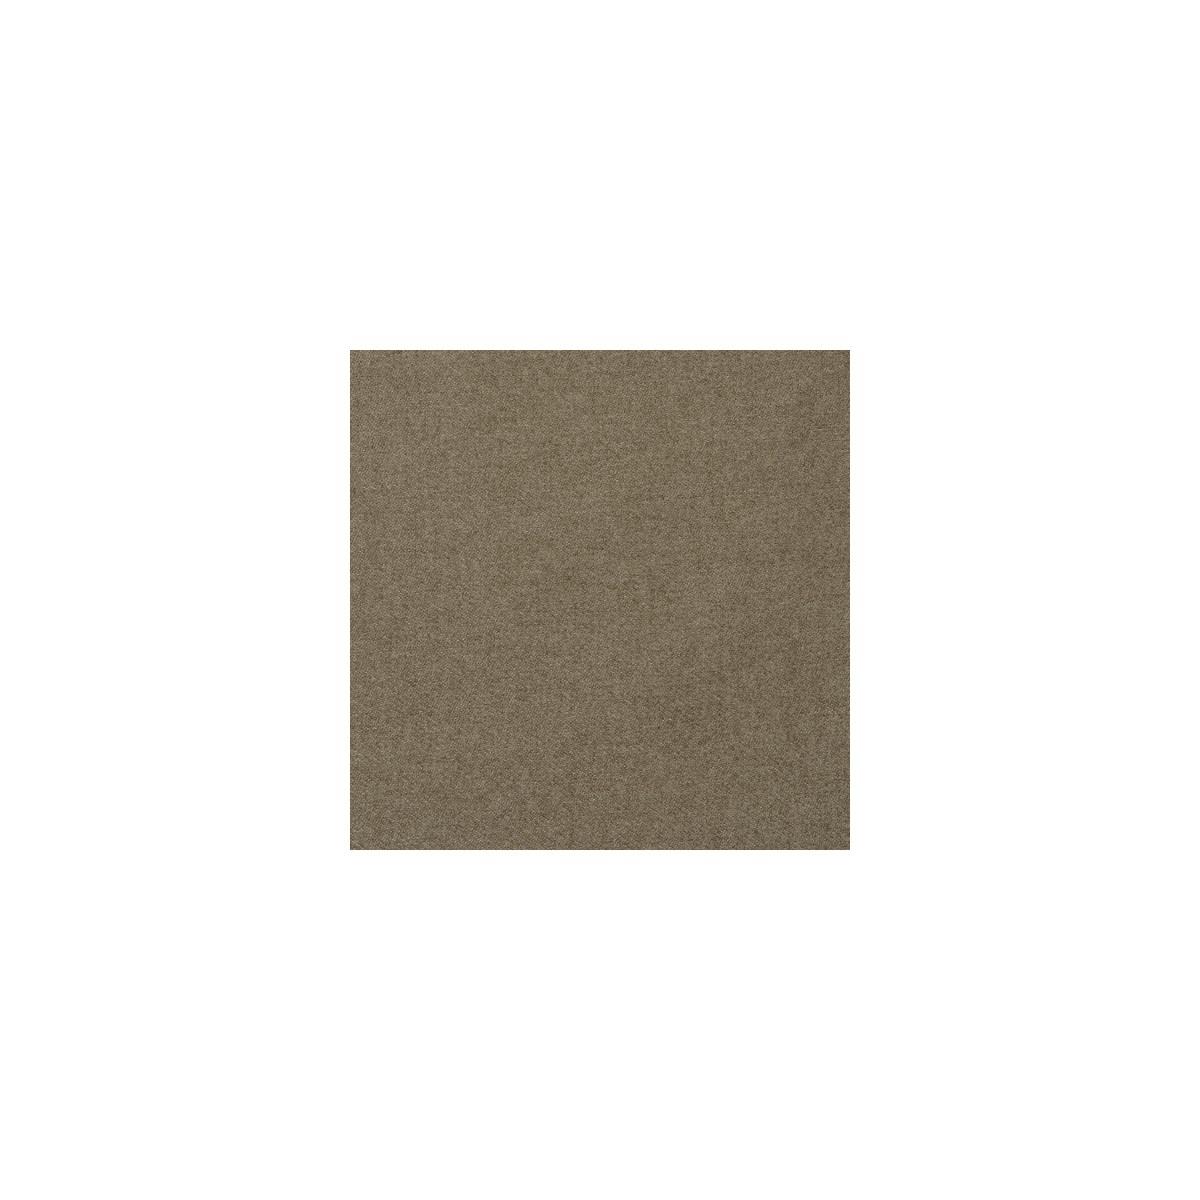 Burgess - Stone - Fabric By the Yard